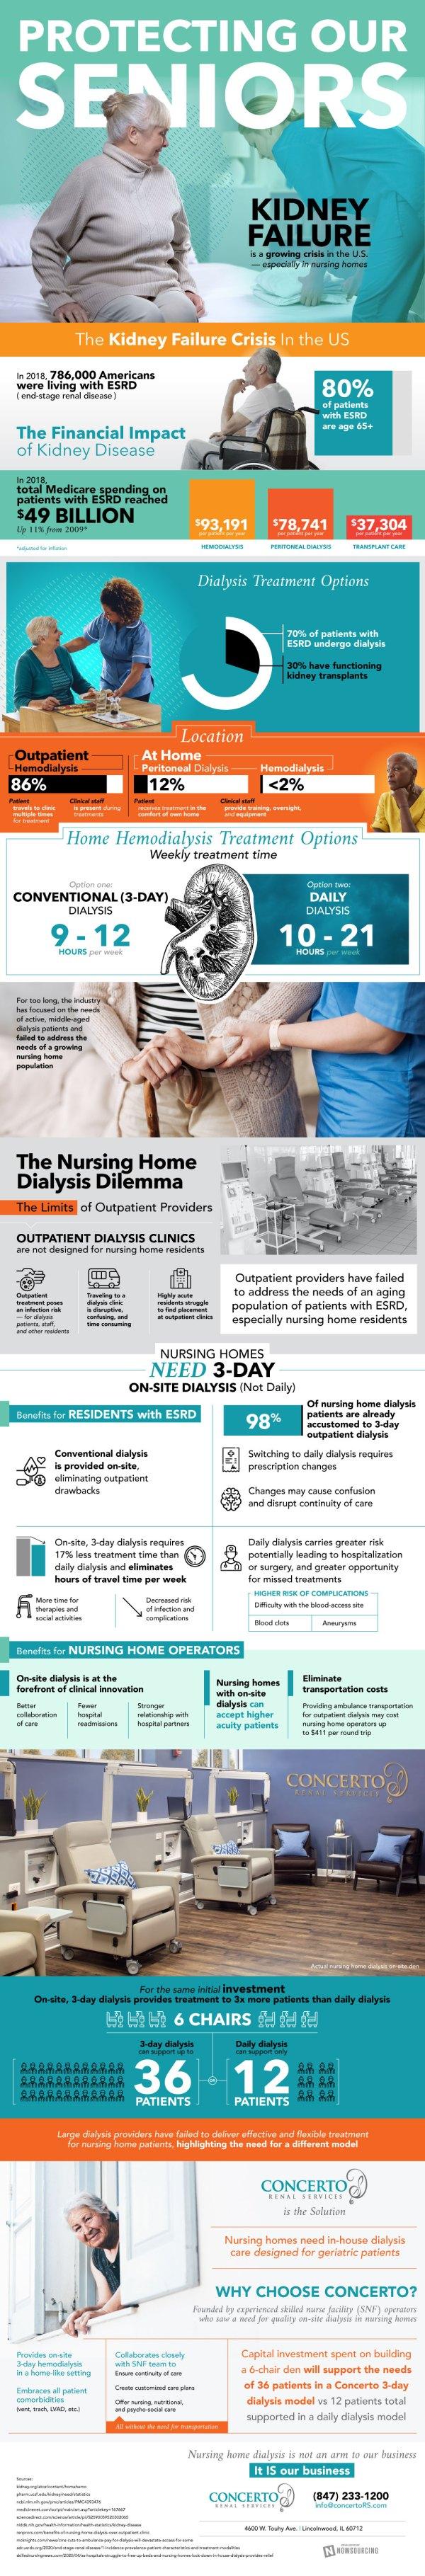 Dialysis in Nursing Homes